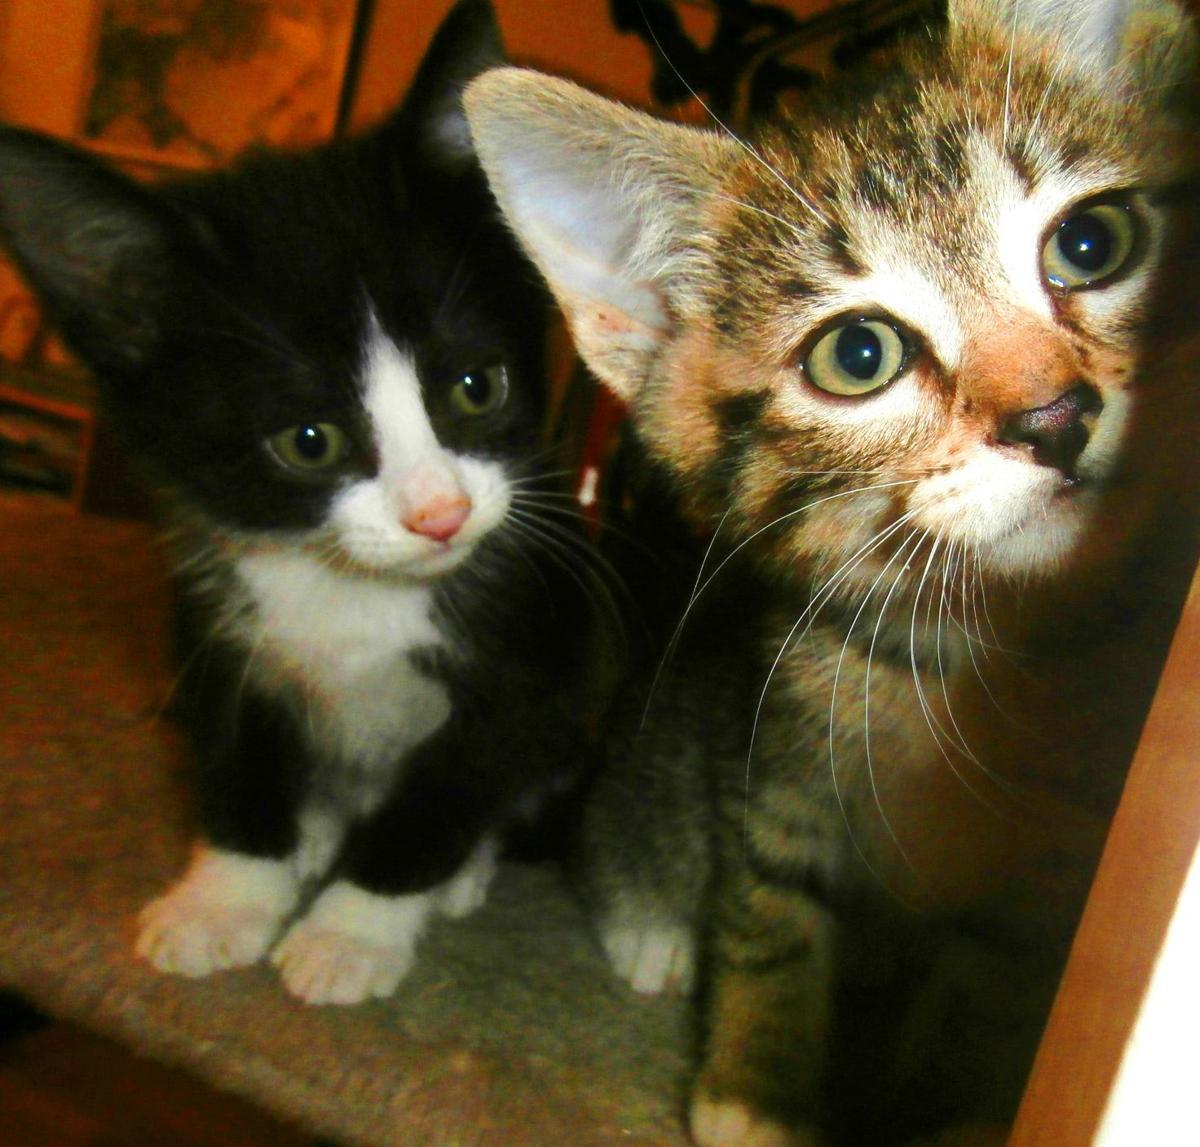 Crescent City Cat Club, Marigny cat cafe, opens Nov. 4_lowres